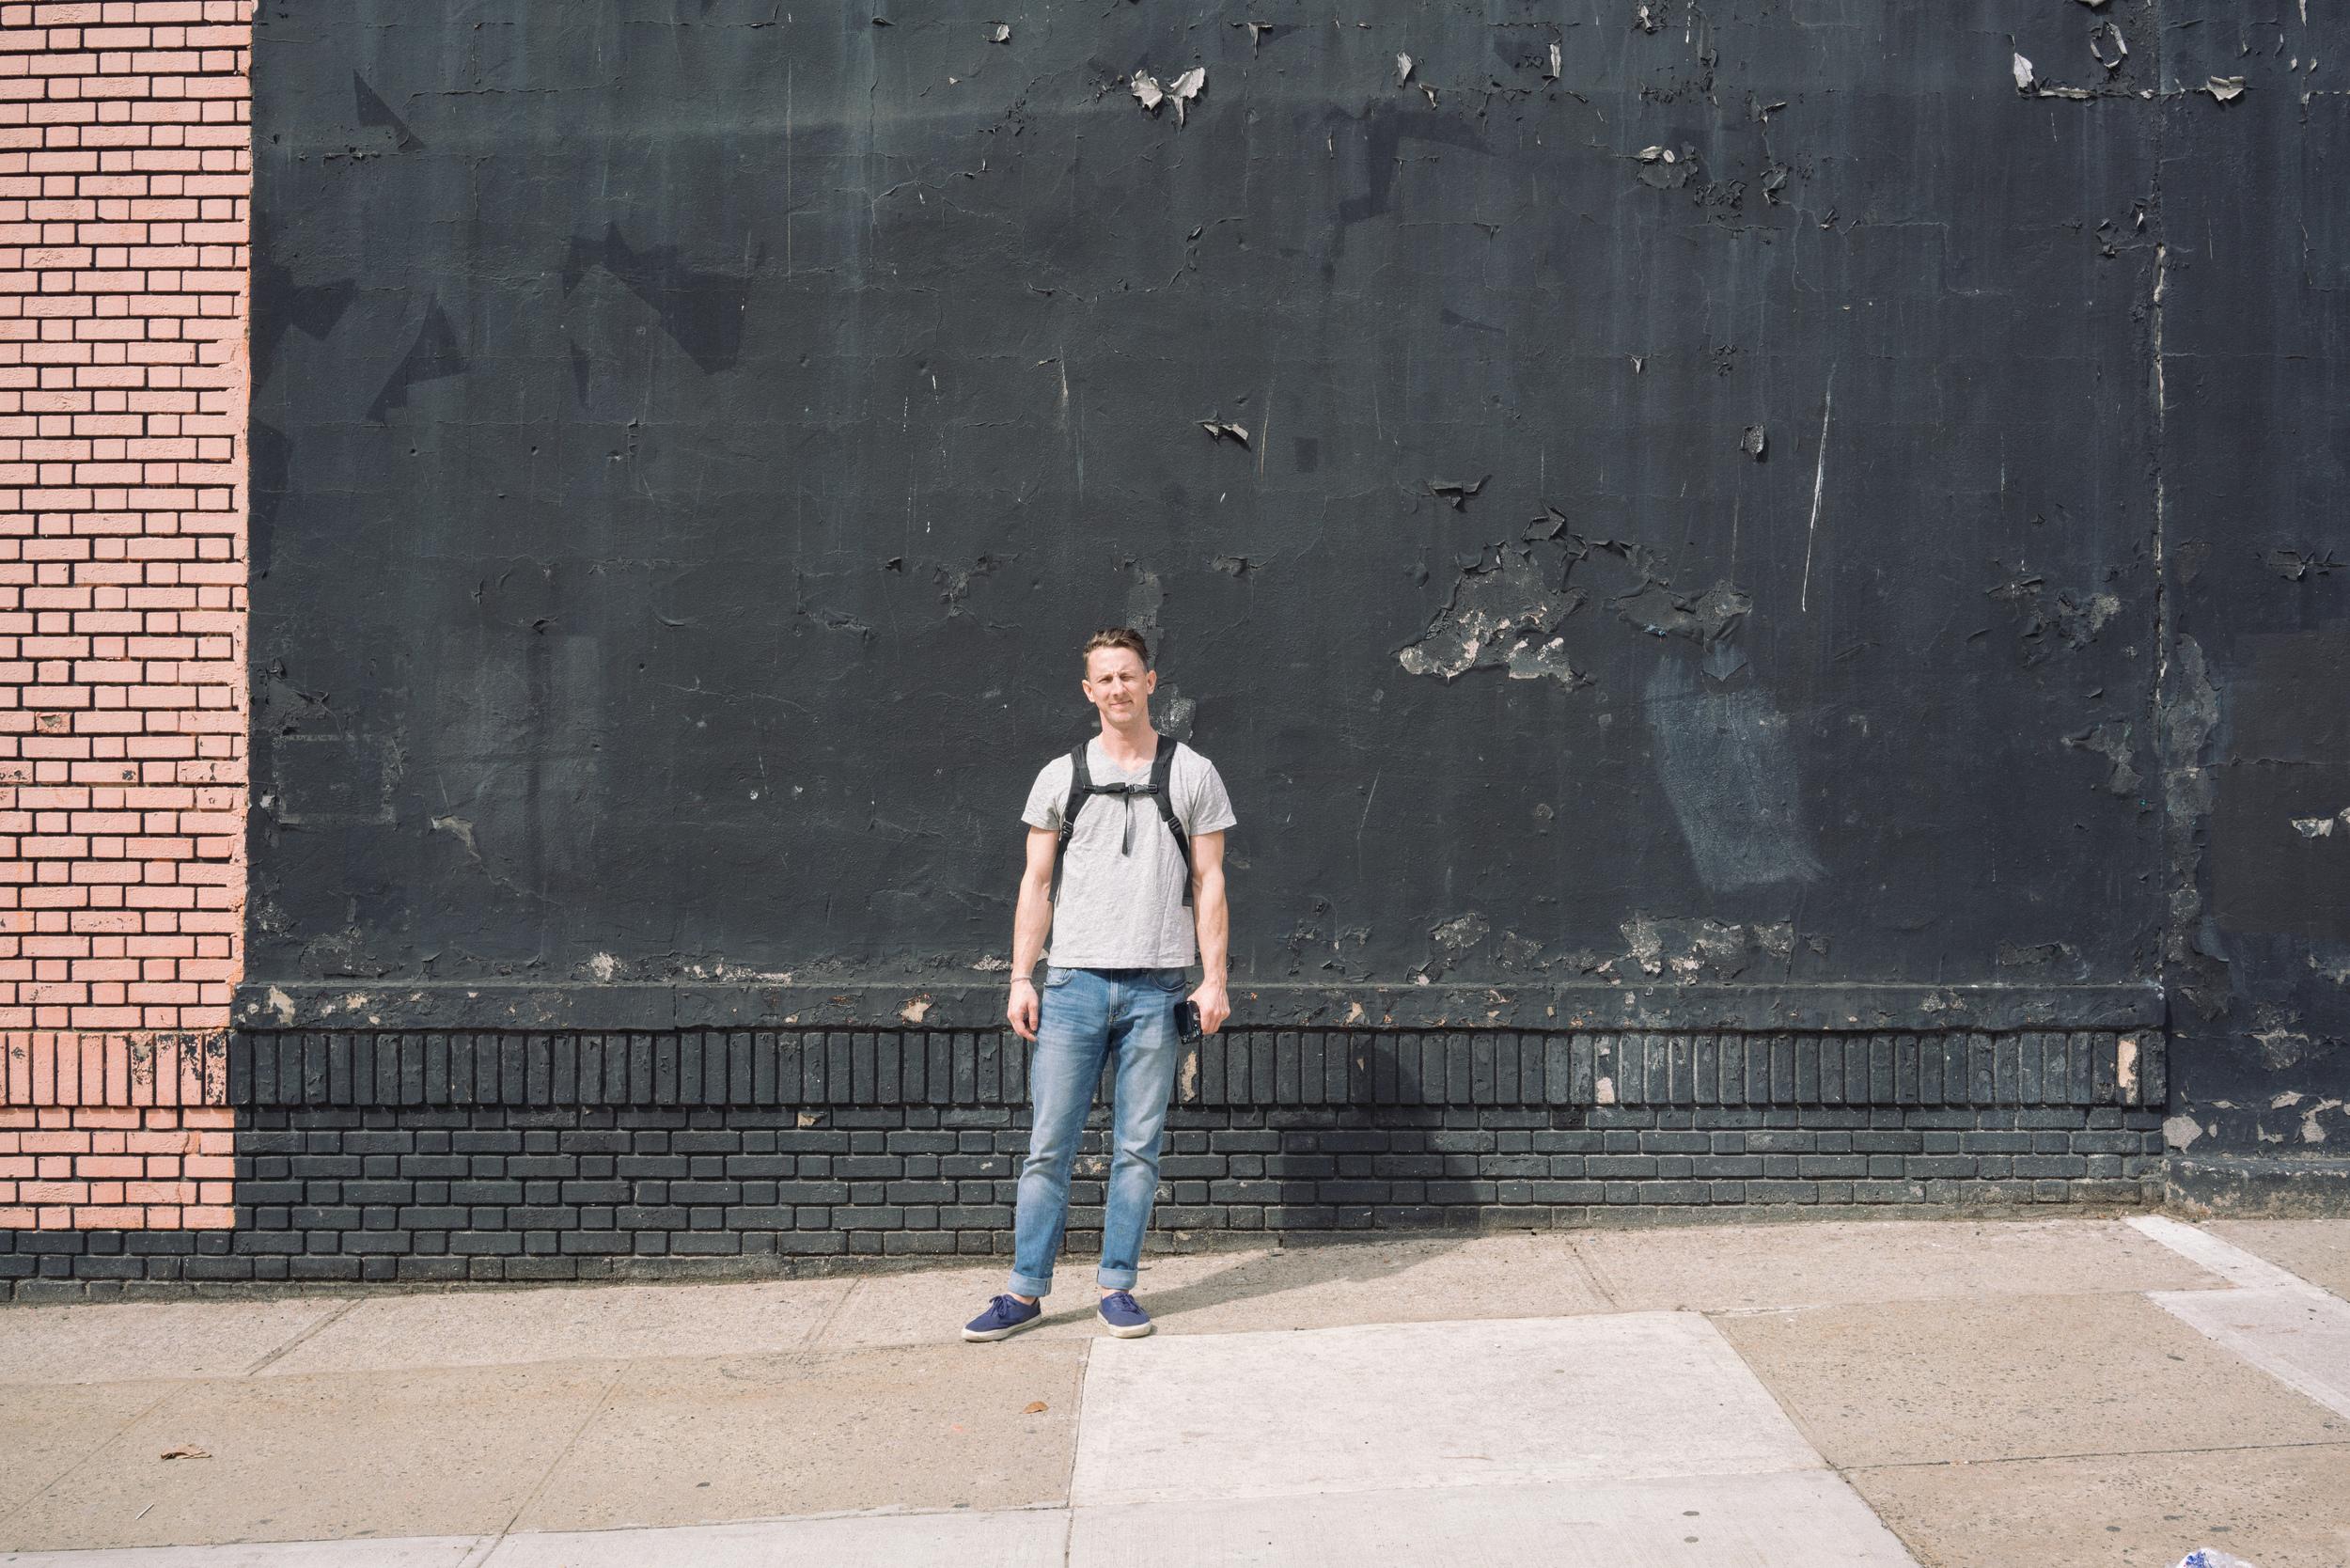 Manhattan Walk-03890.jpg